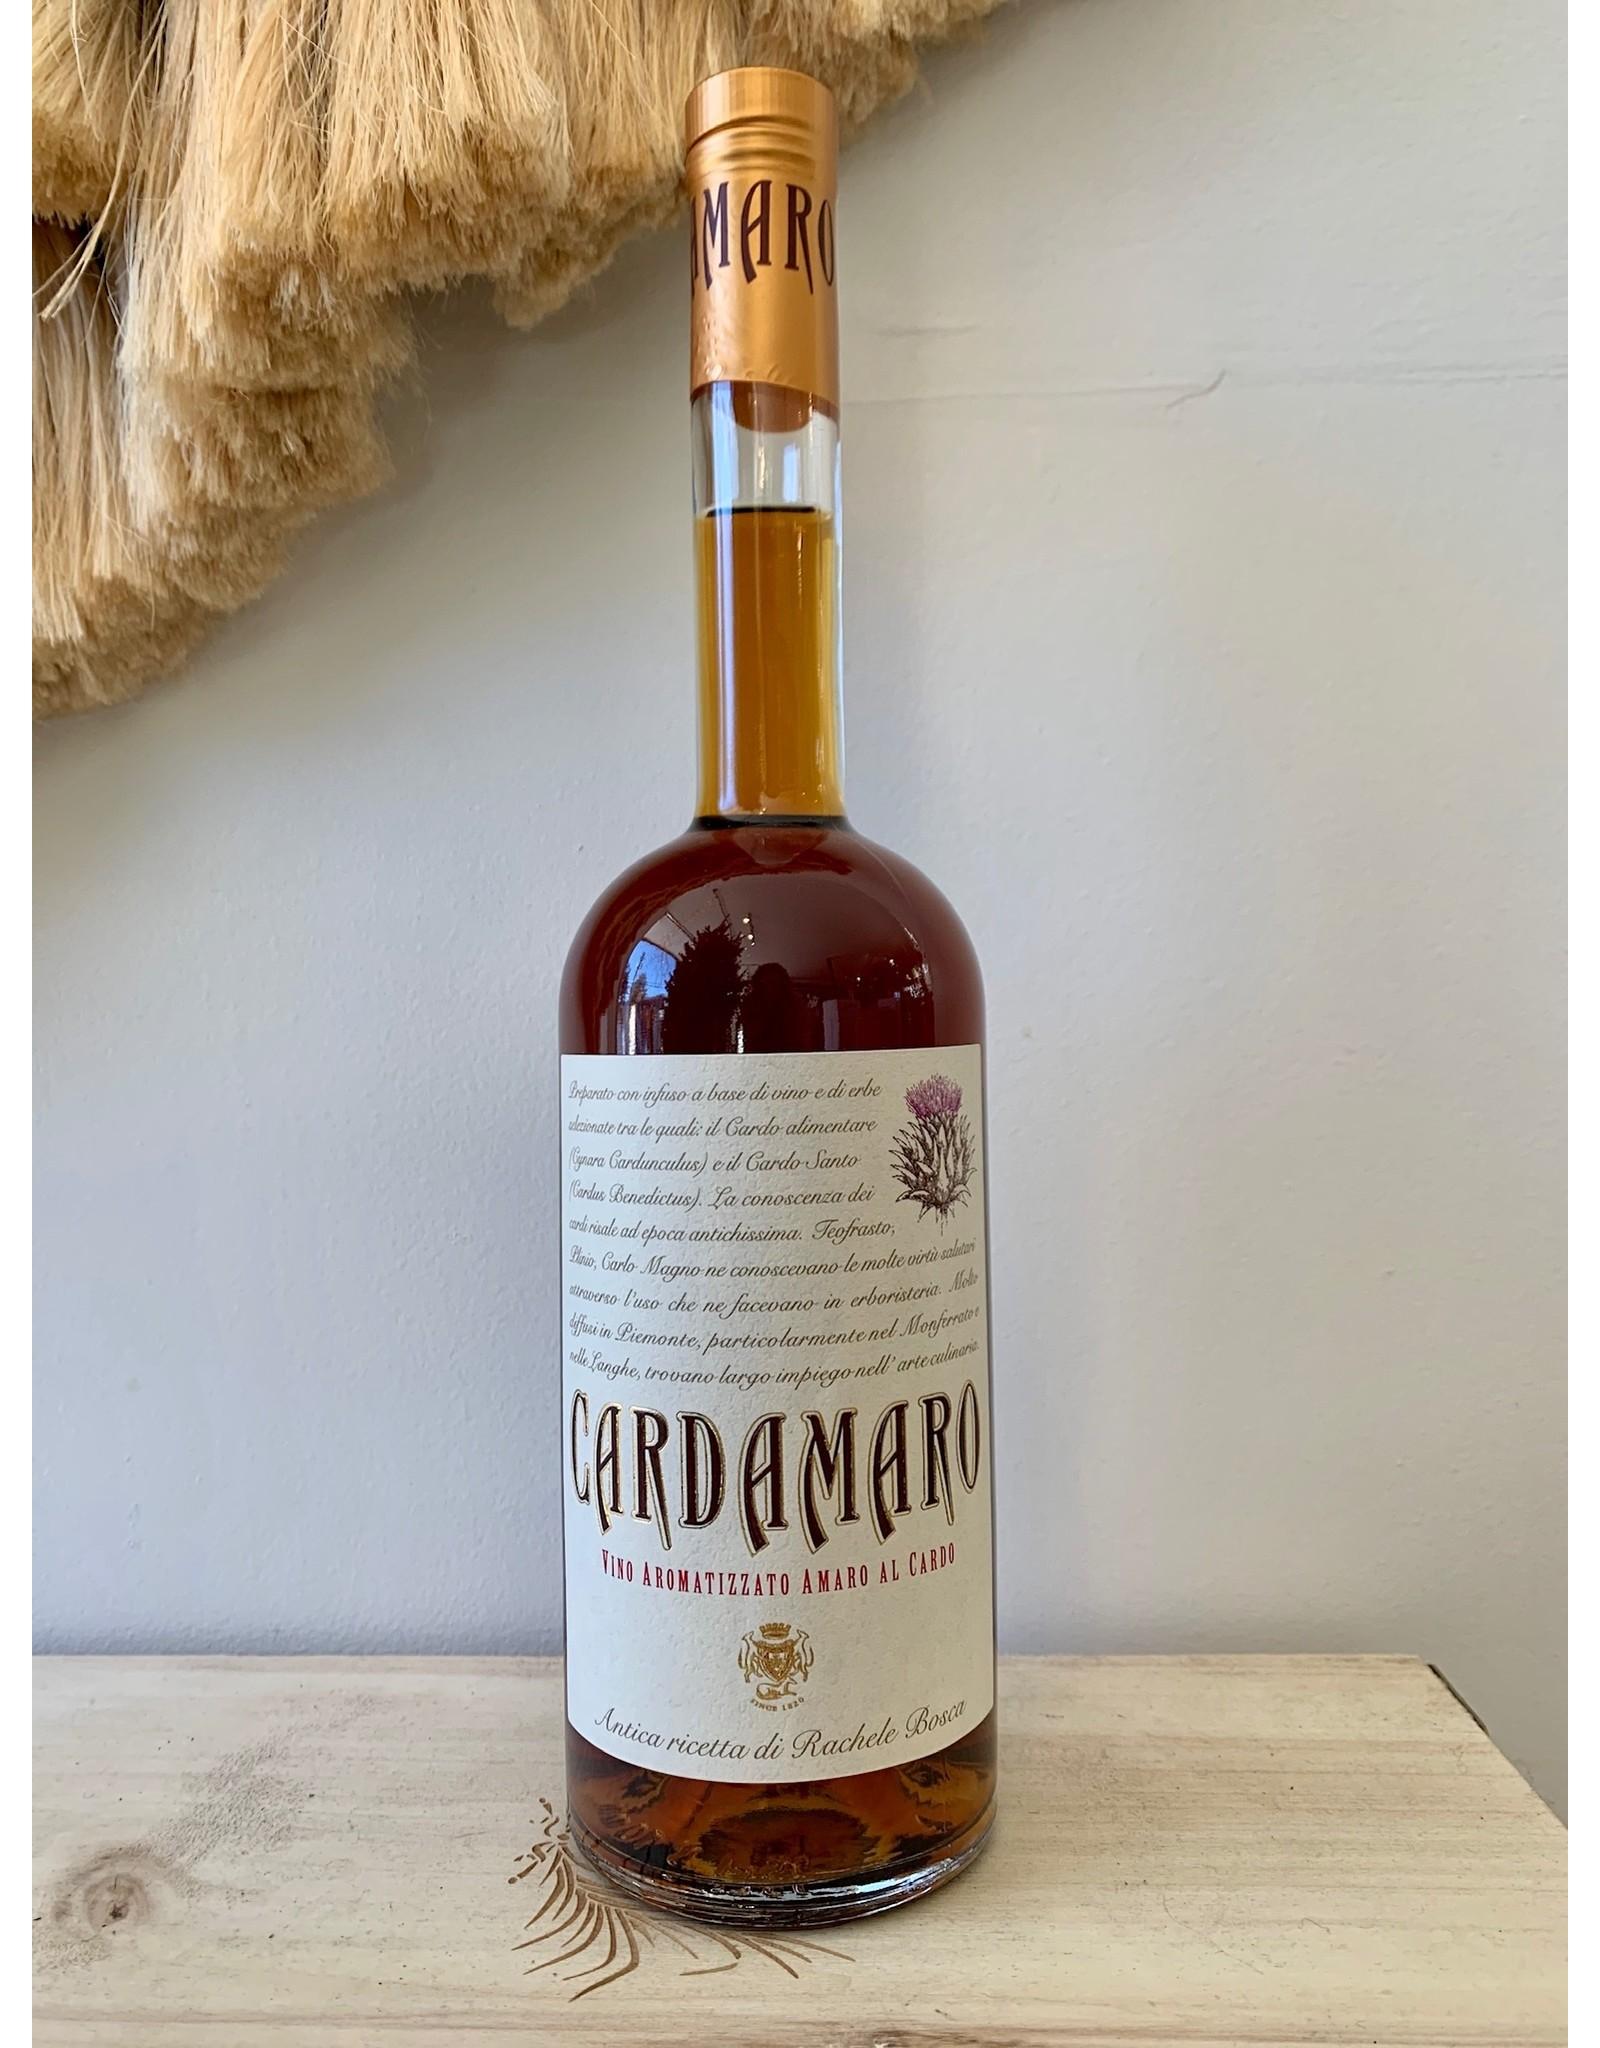 Cardamaro Vino Amaro